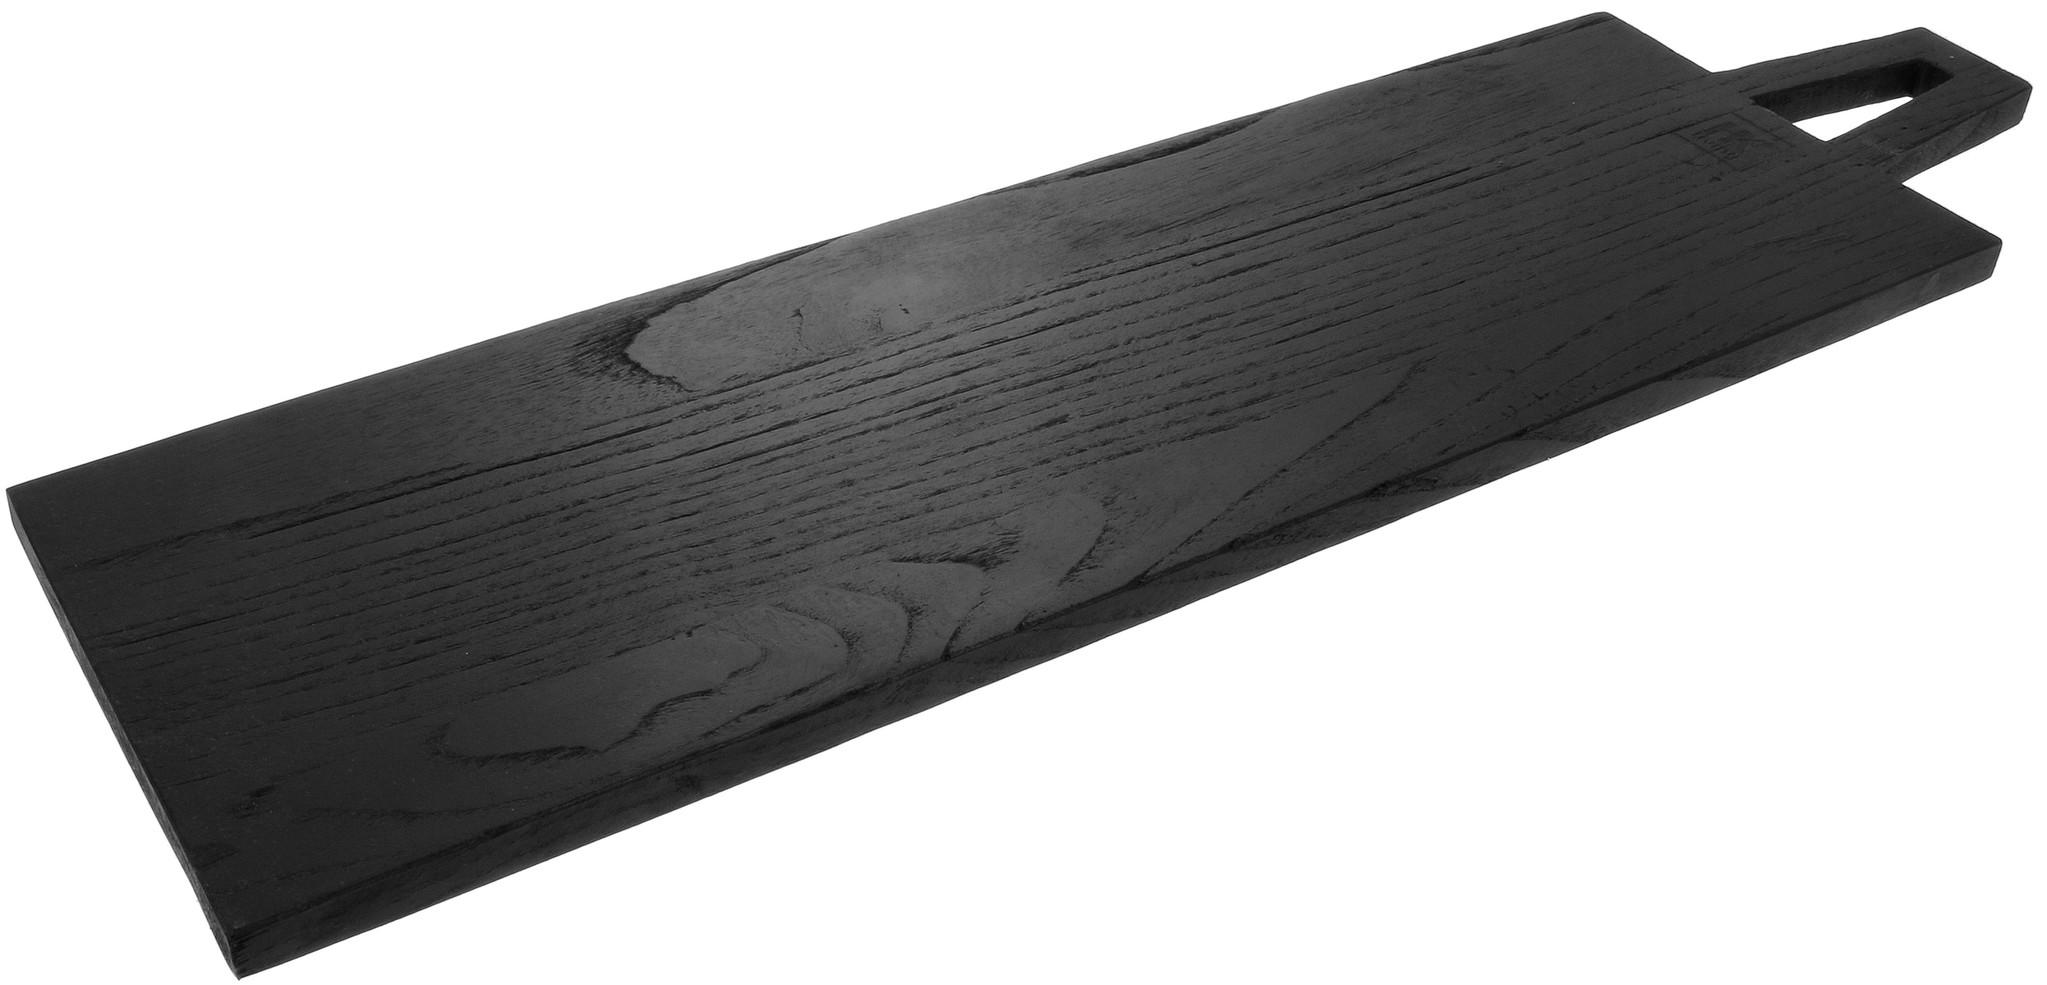 Broodplank Square M 55x15cm Black-3